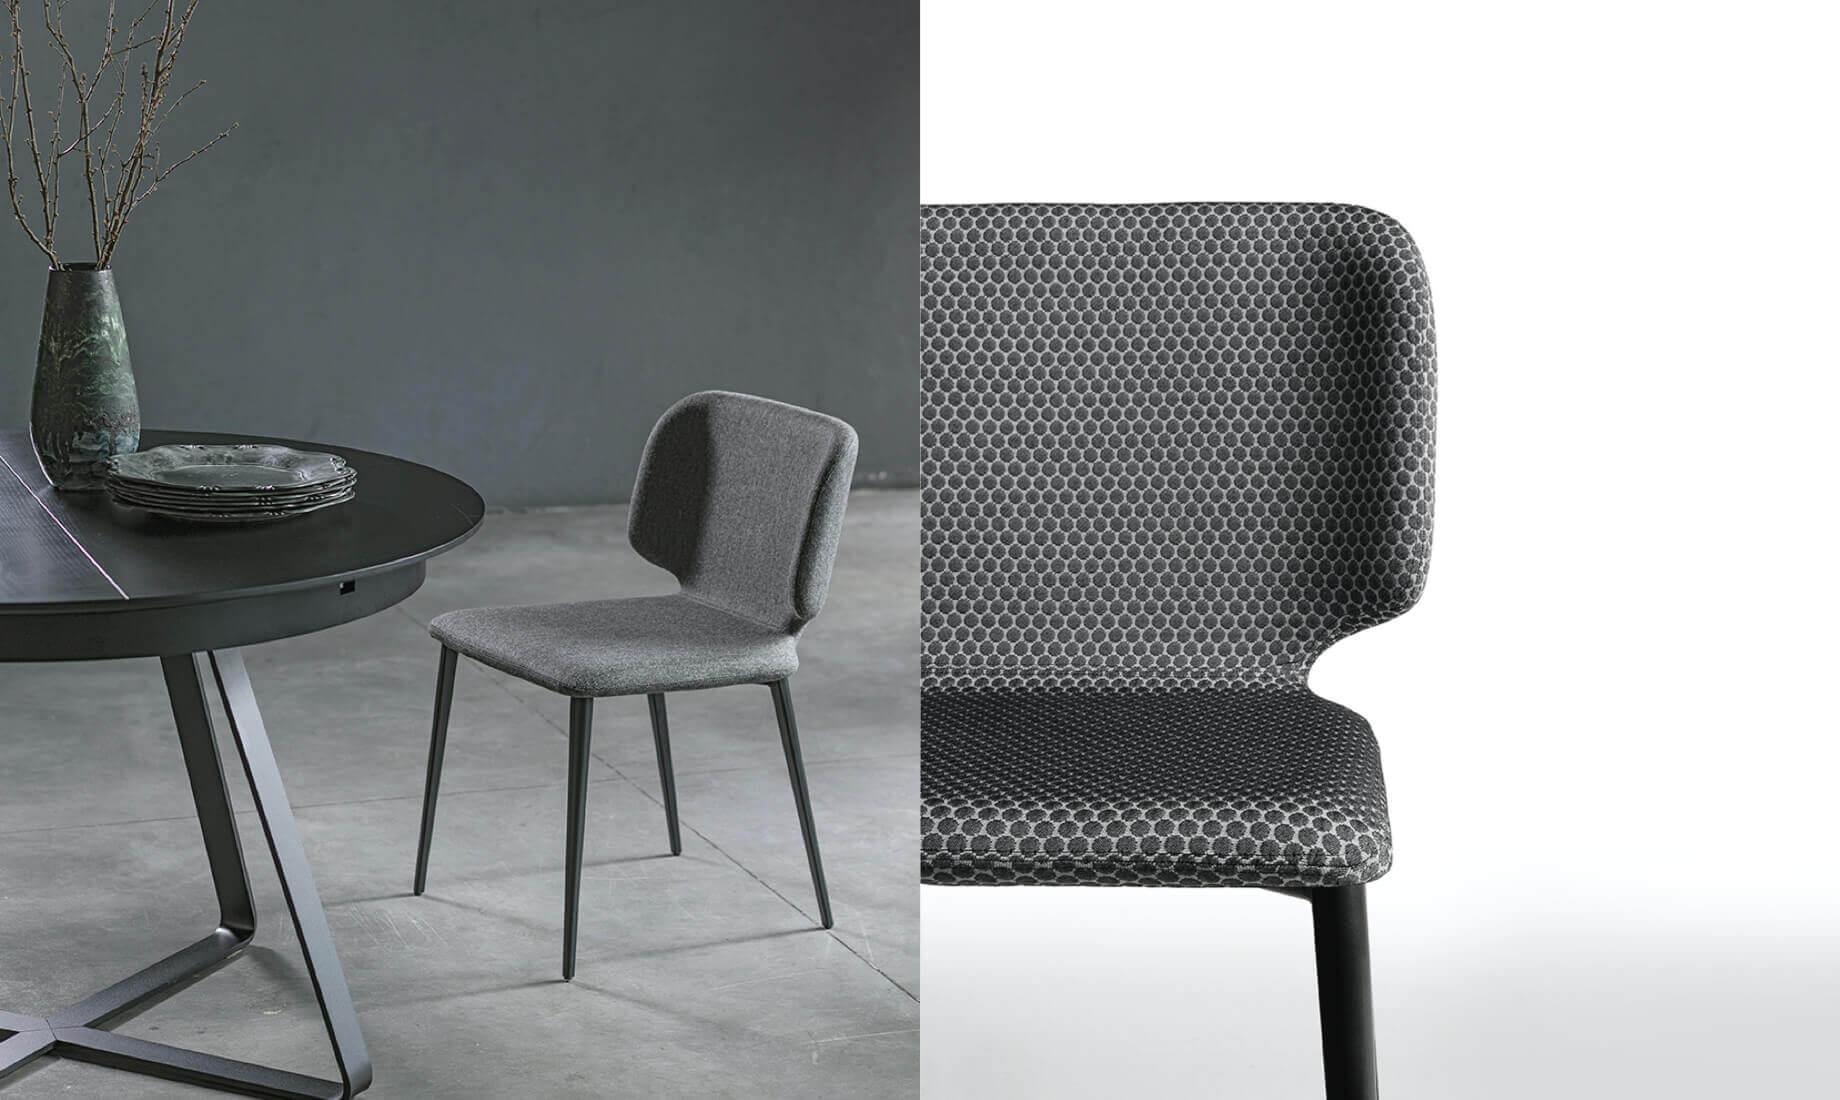 Midj - Pantone 2021 - Wrap chair